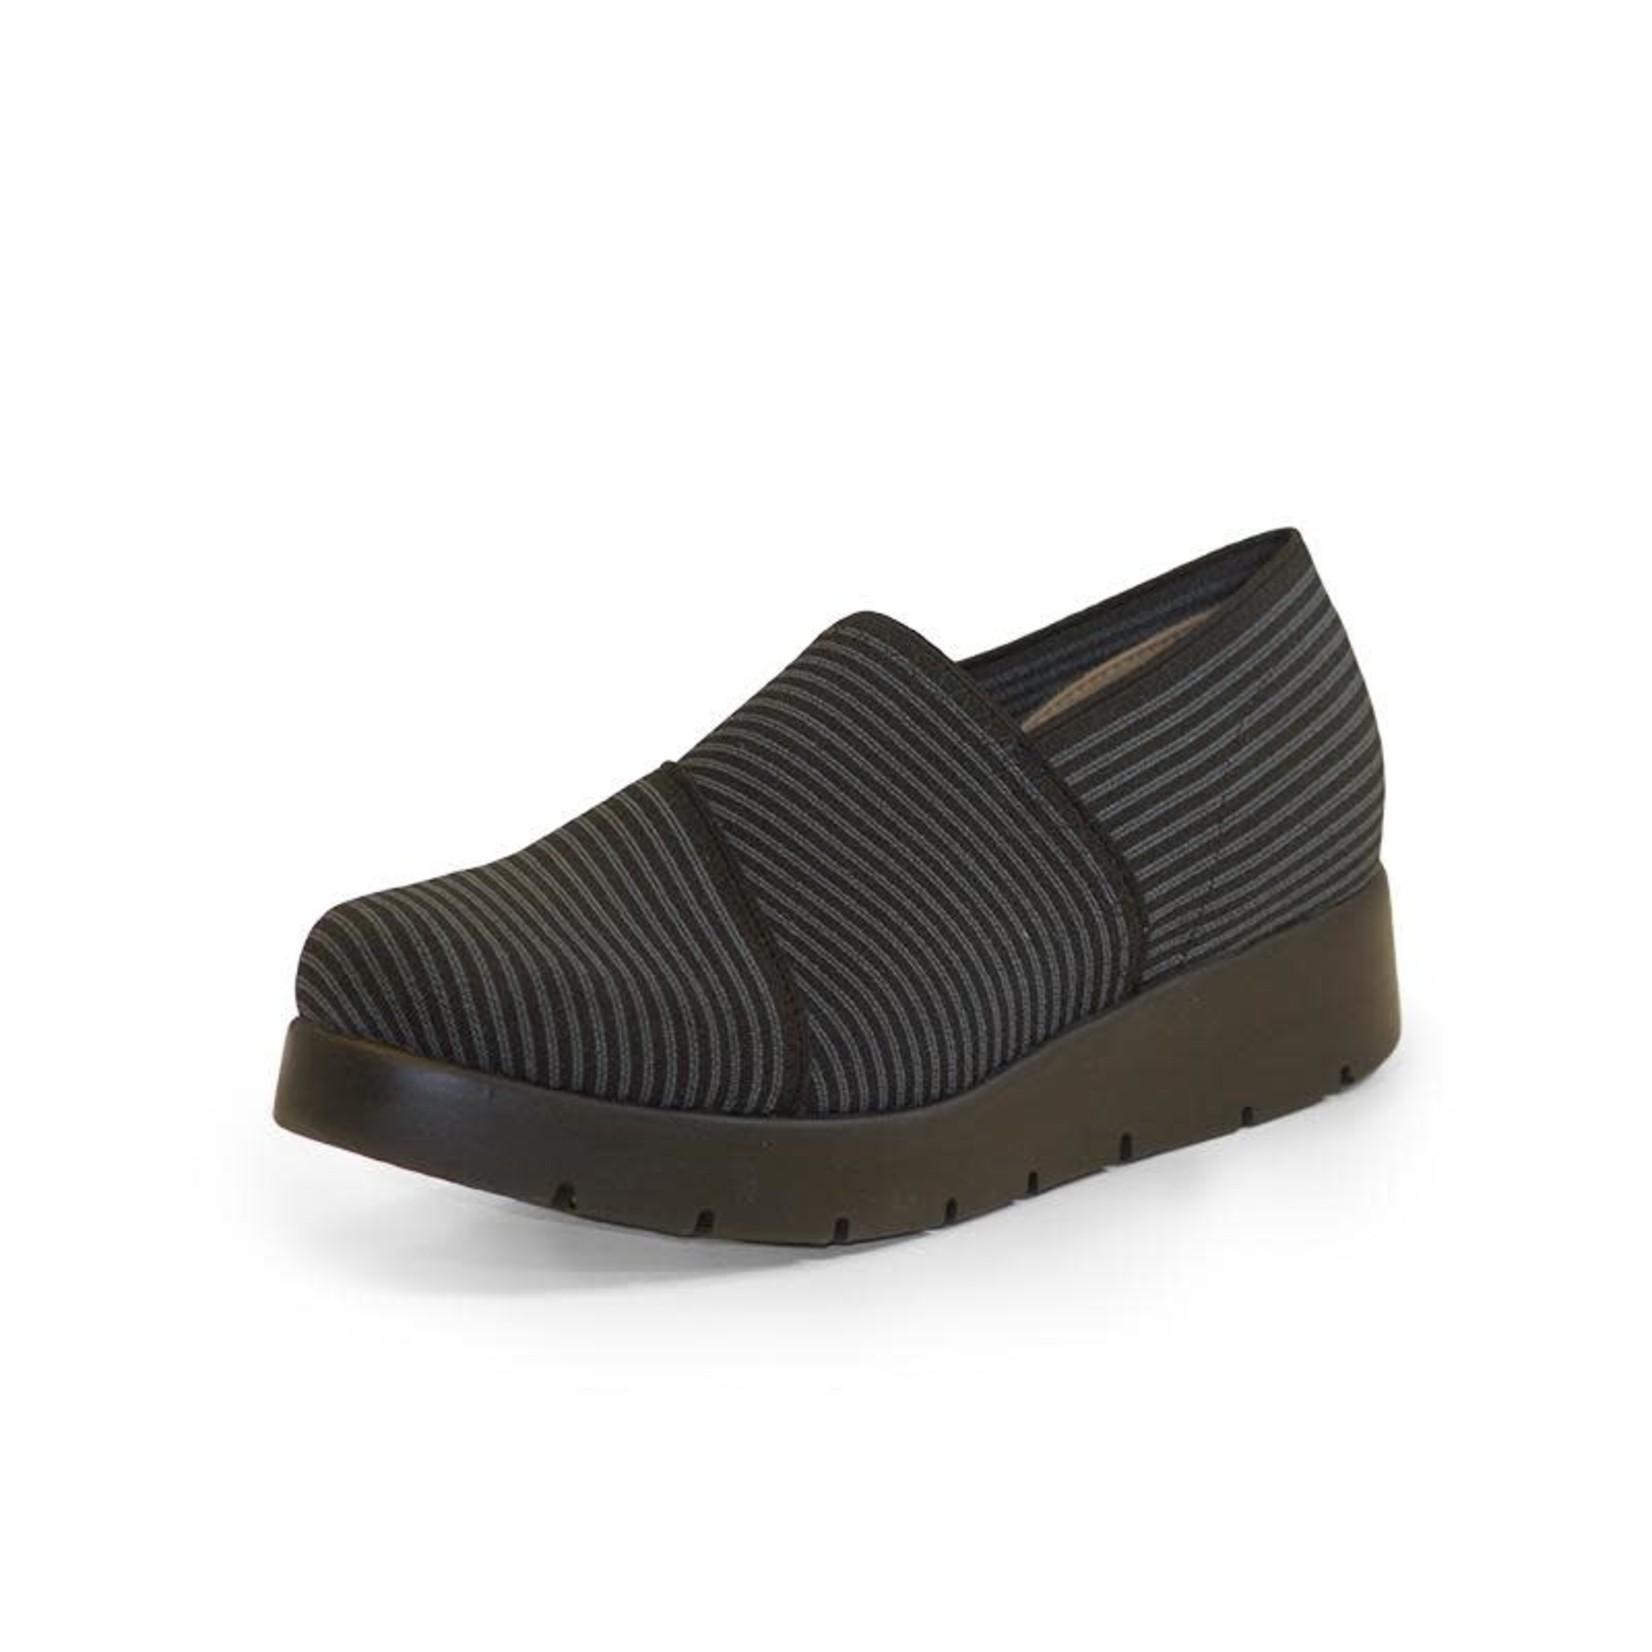 Milly Shoe in Gray Pin Stripe 10